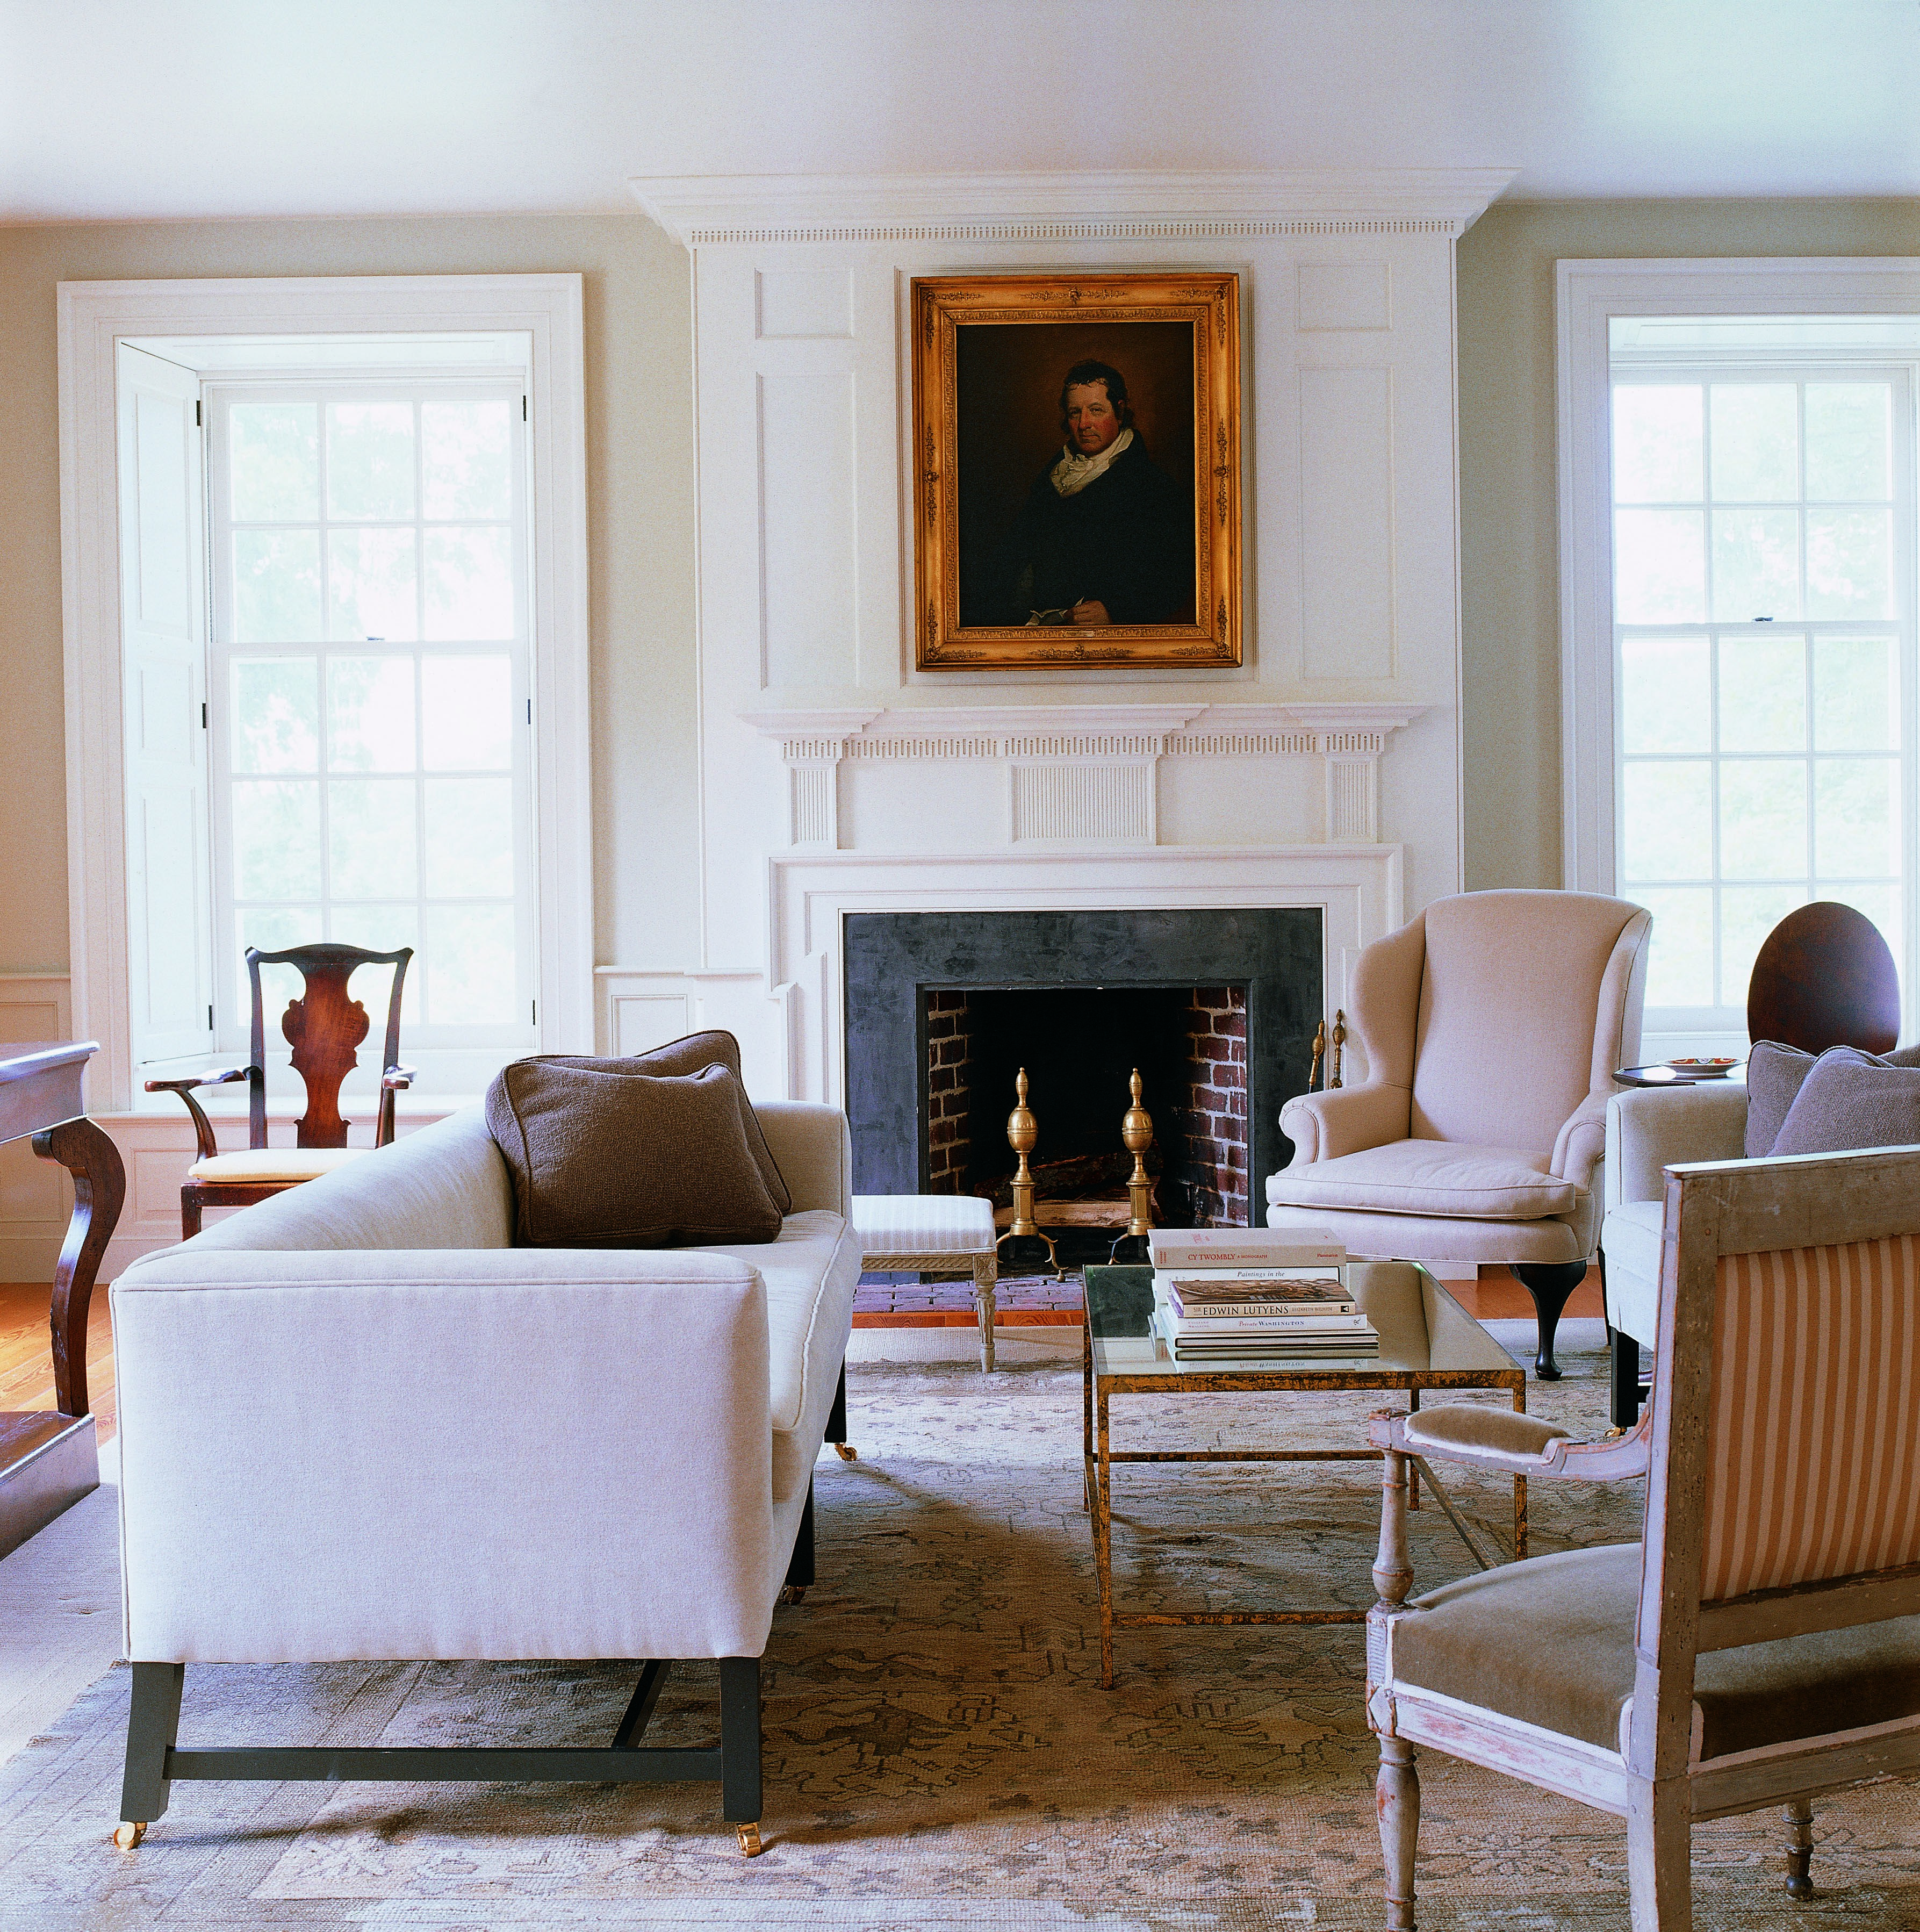 5 Interiors By Washington D C Based Designer Darryl Carter Inc Photos Architectural Digest